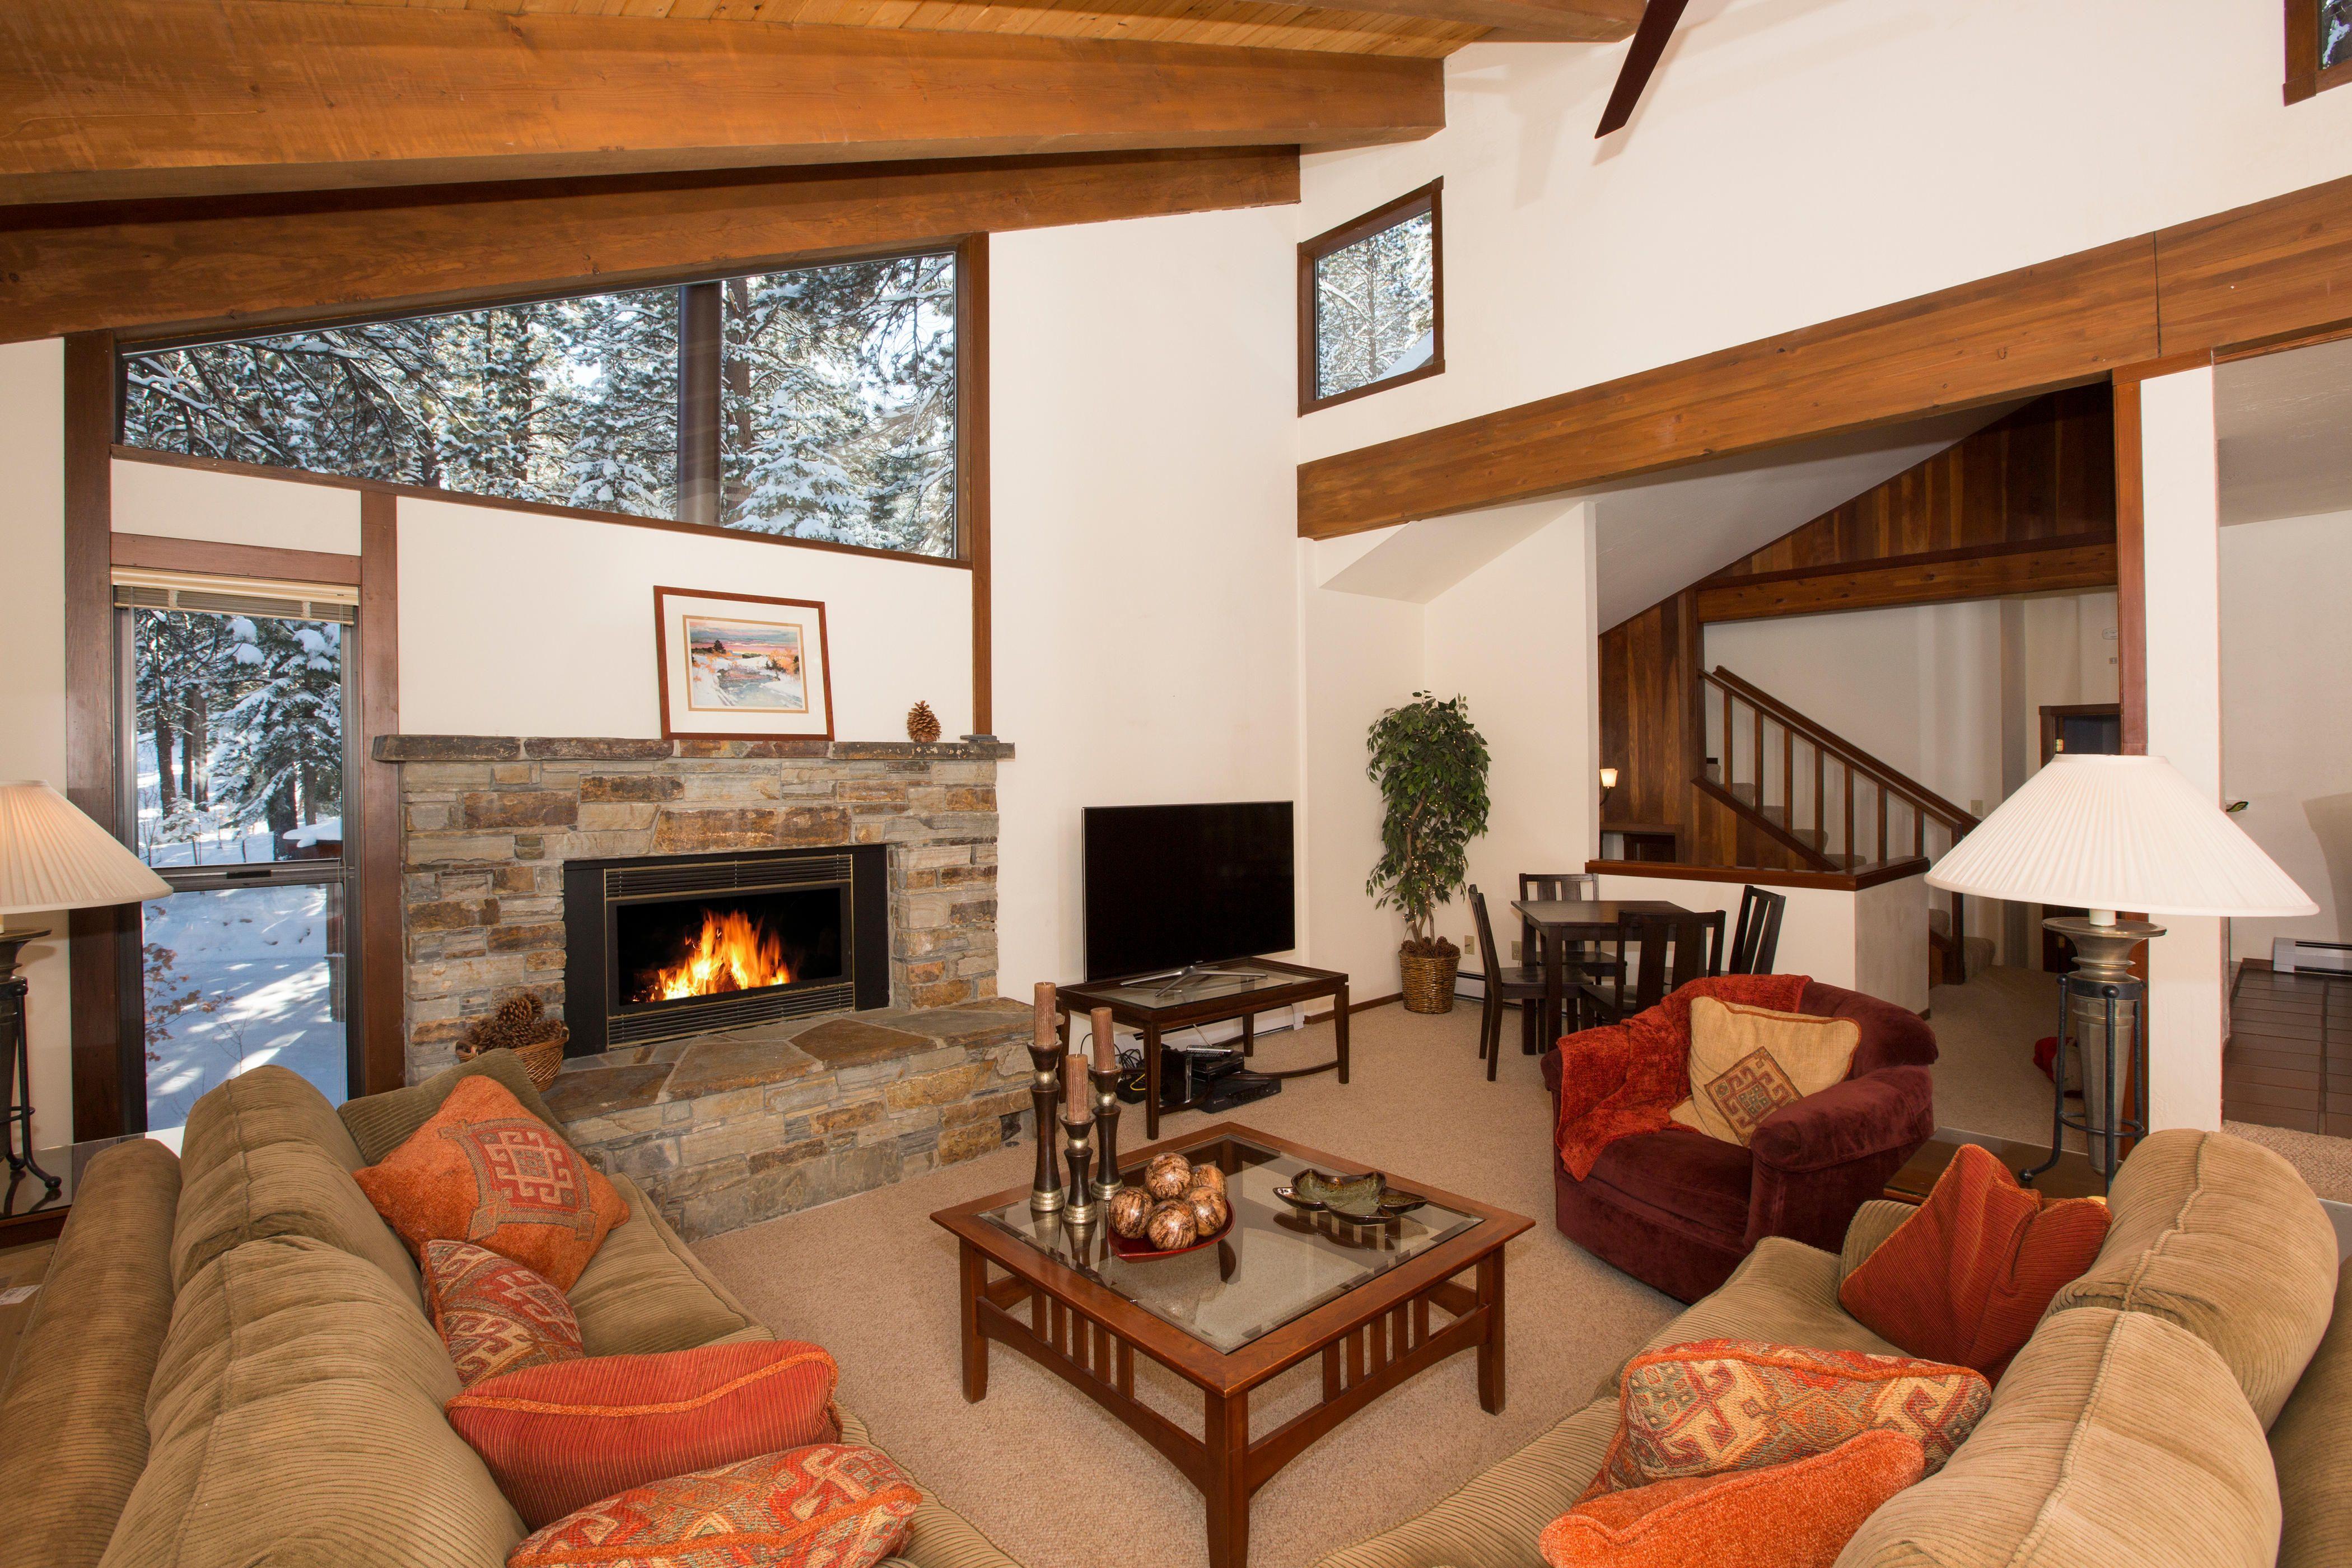 winter rental pinecrest vacation lake creek tahoe rentals cabins at